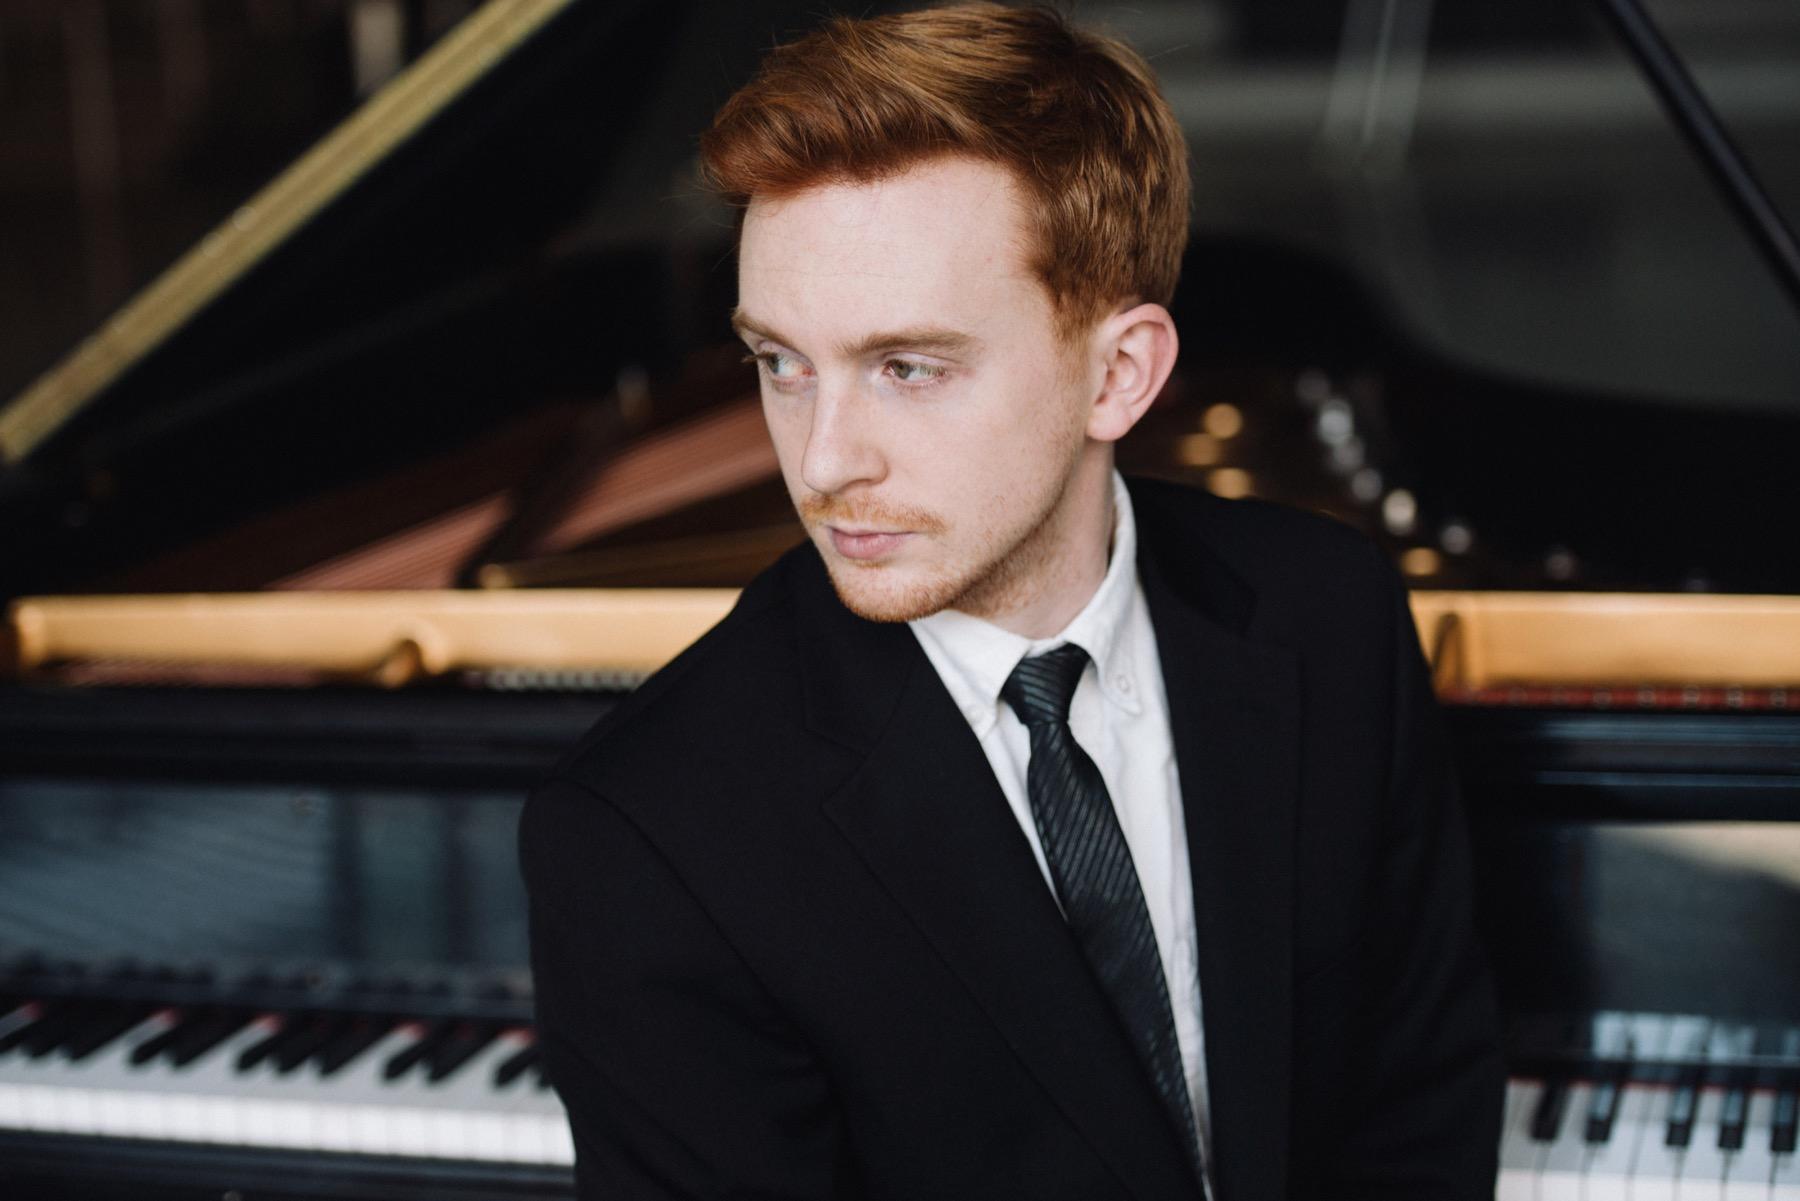 DAME MYRA HESS MEMORIAL CONCERTS | CHRISTOPHER GOODPASTURE, PIANO